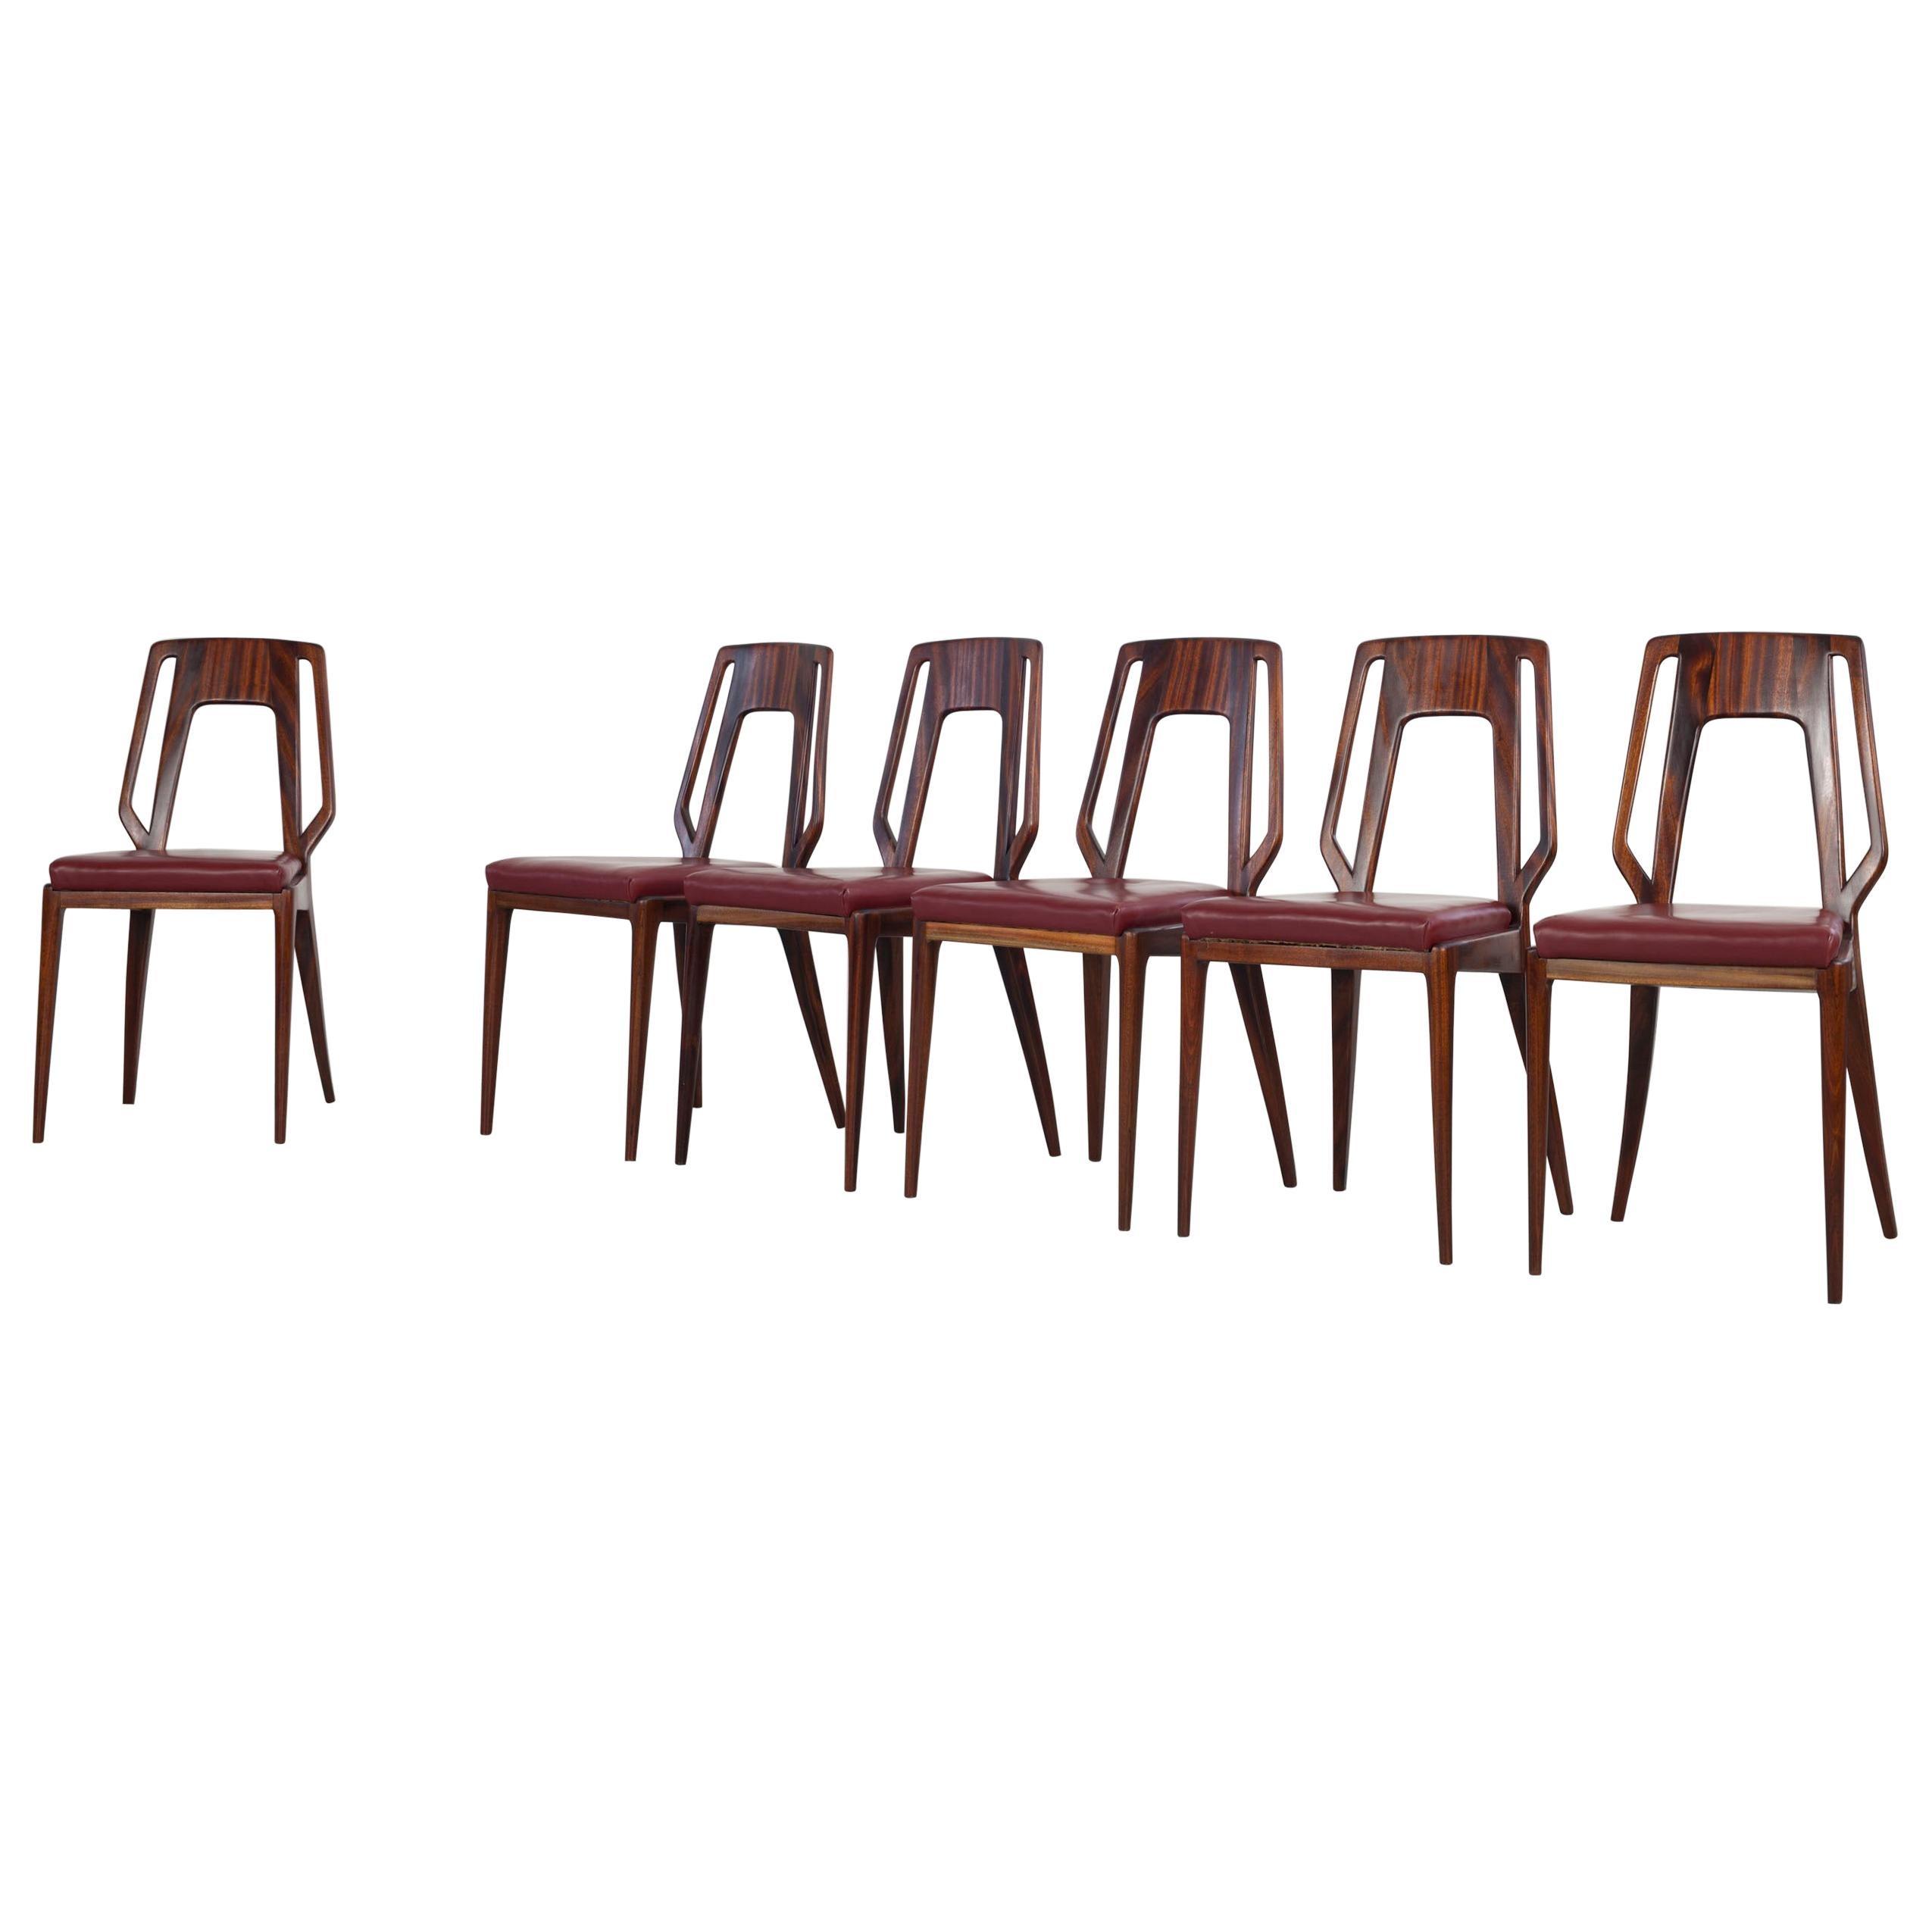 Set of 6 Italian Vittorio Dassi Dining Room Chairs, 1950s